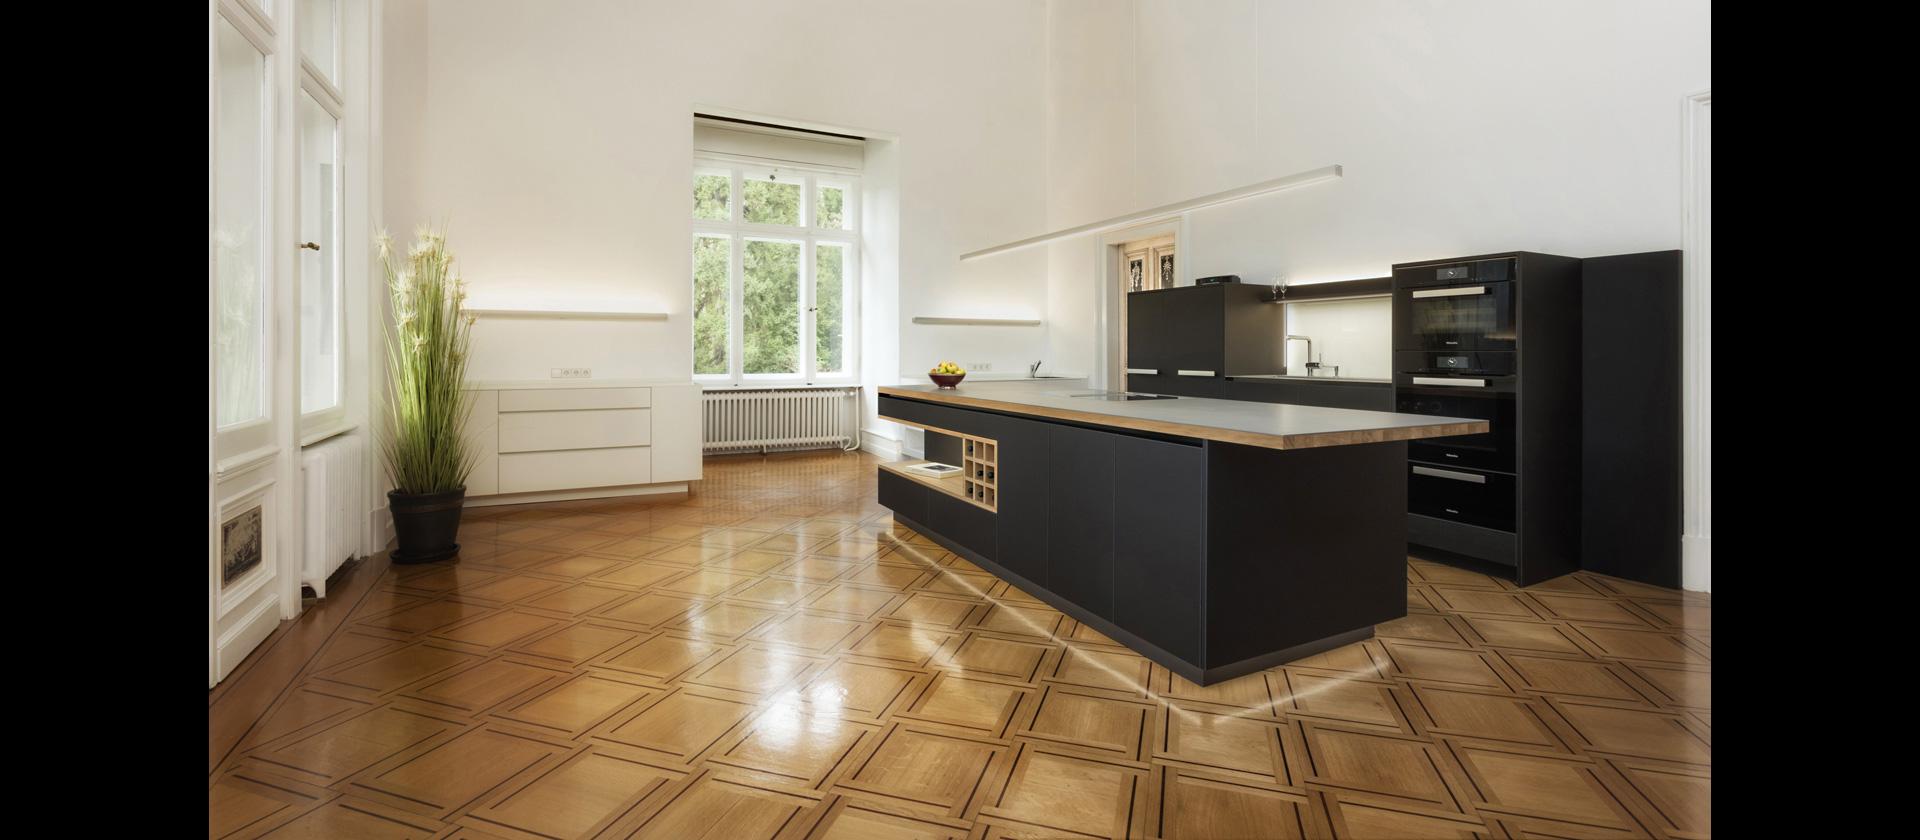 MTB-Küche Lino Edelstahlarbeitsplatte